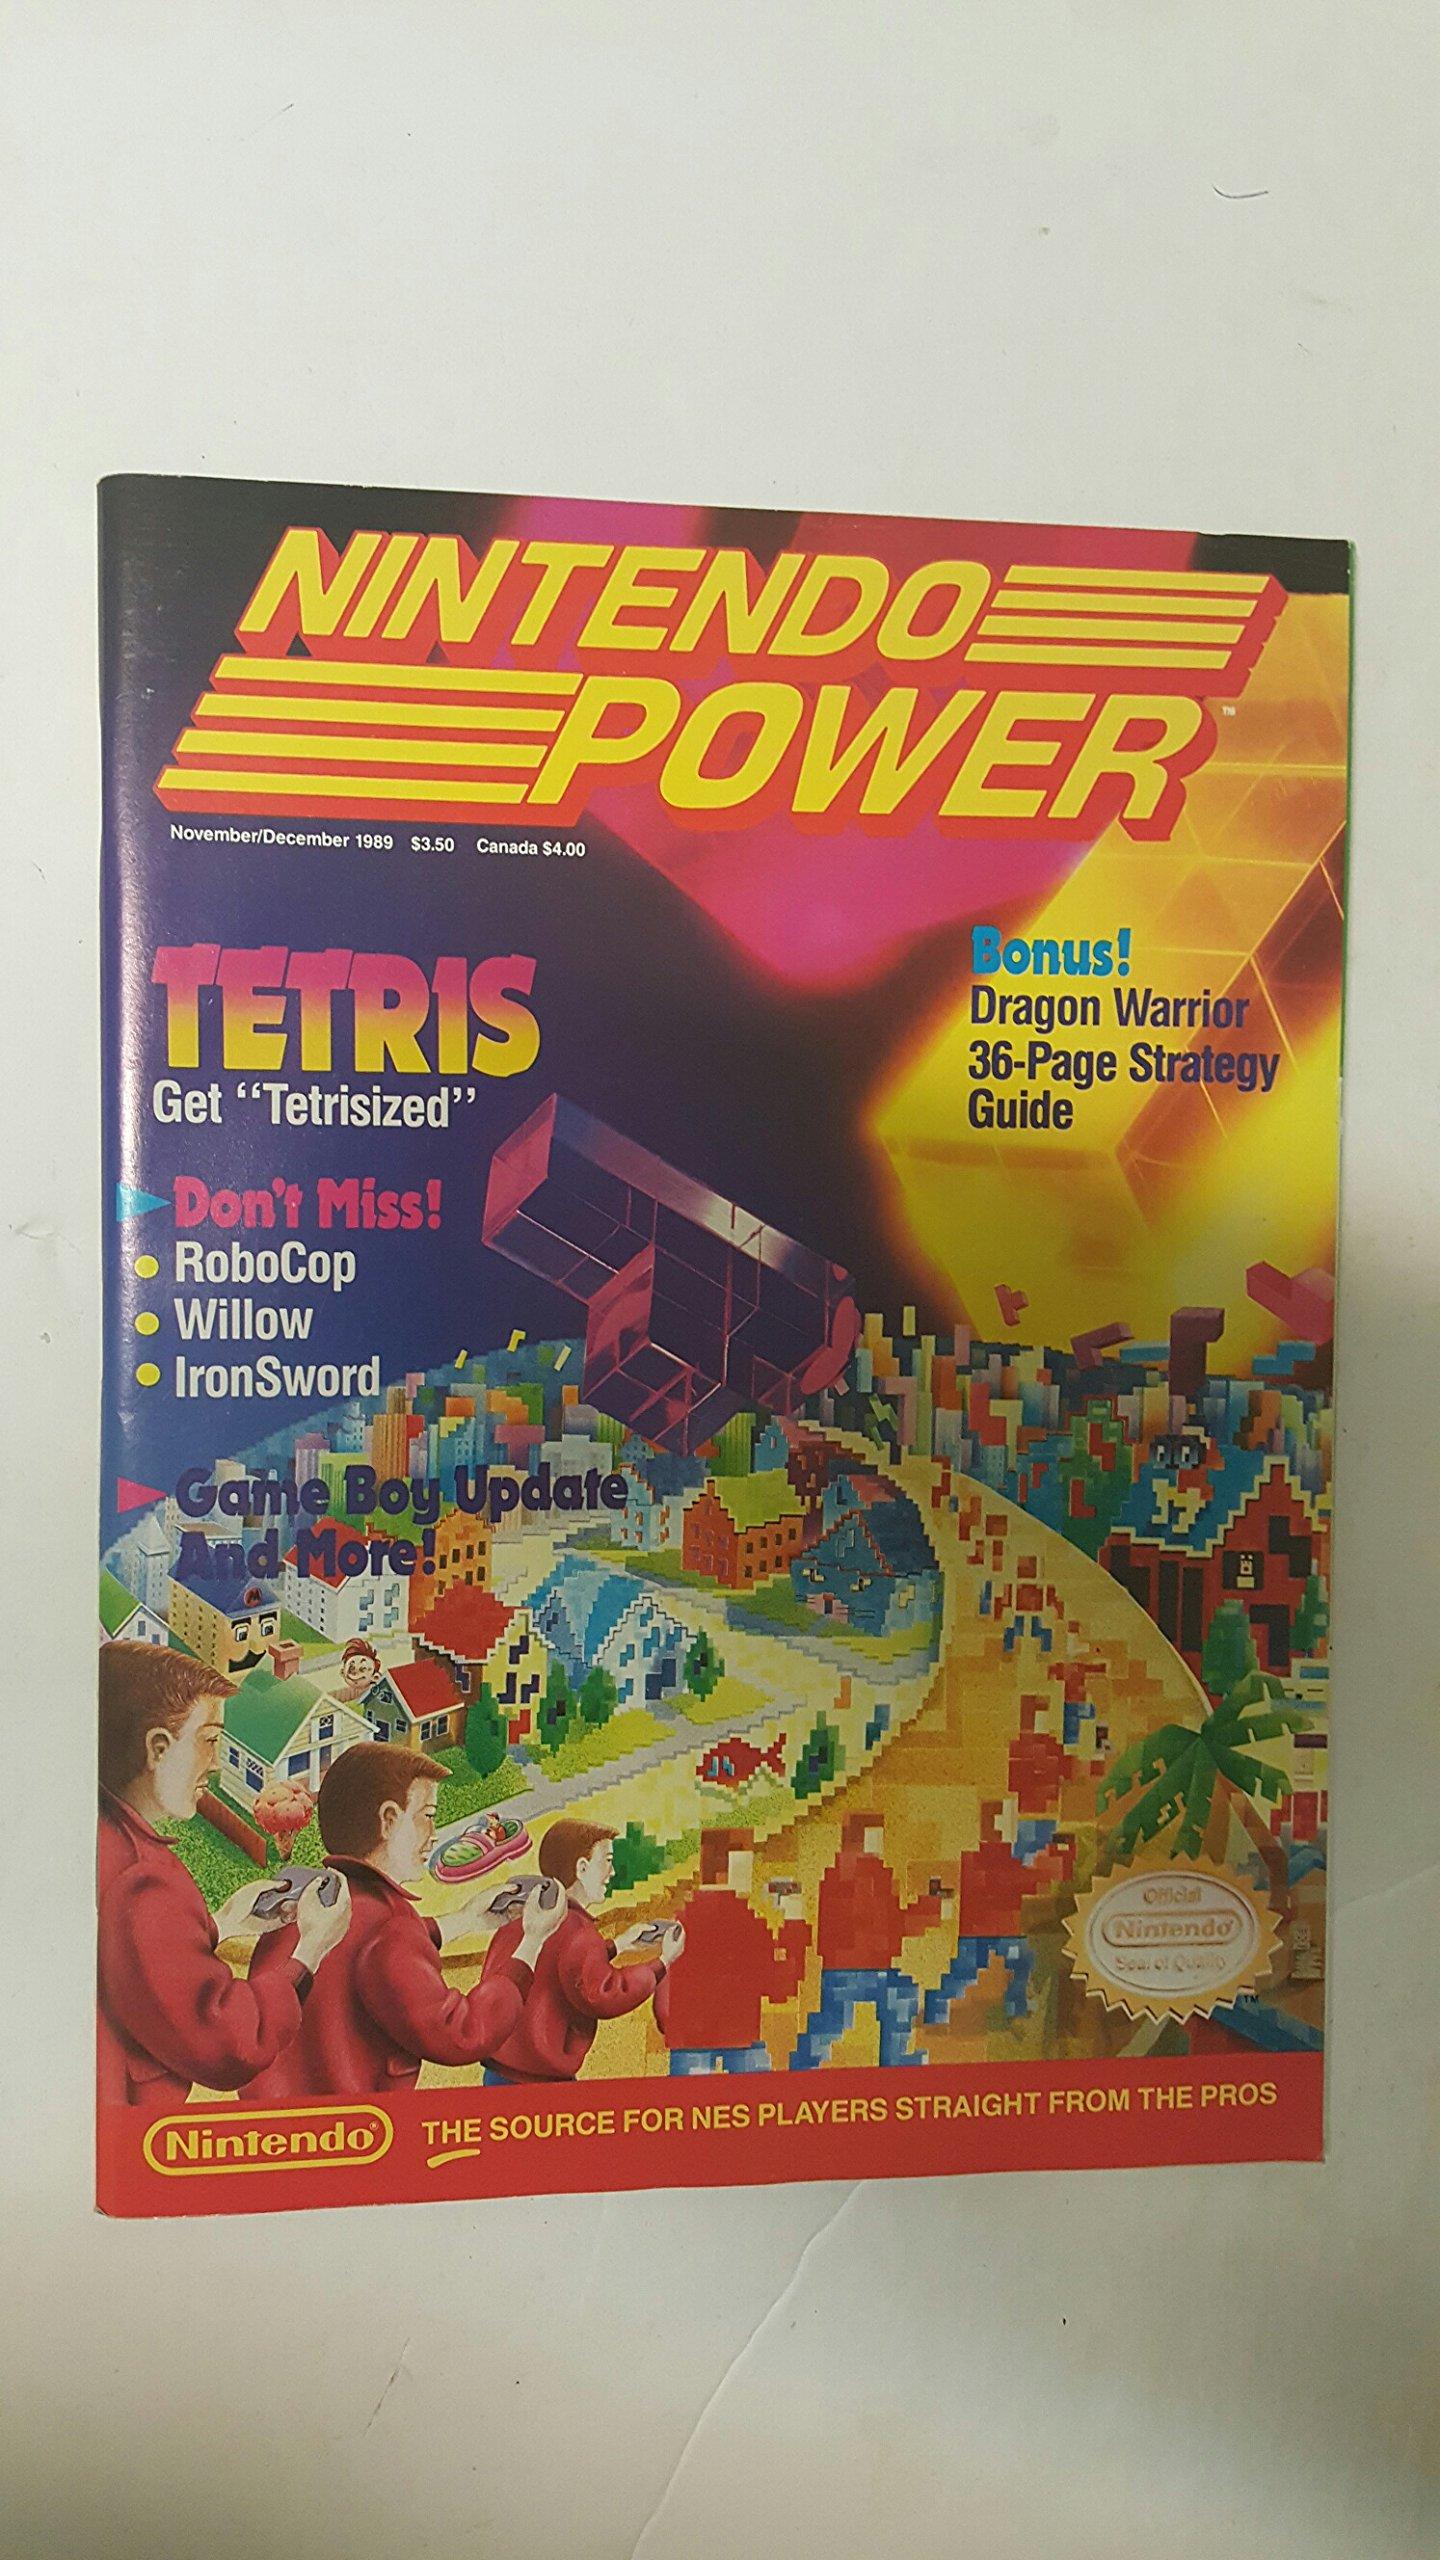 Nintendo Power Iss Nov/Dec 1989 (Vol 9) Tetris NES: by ...